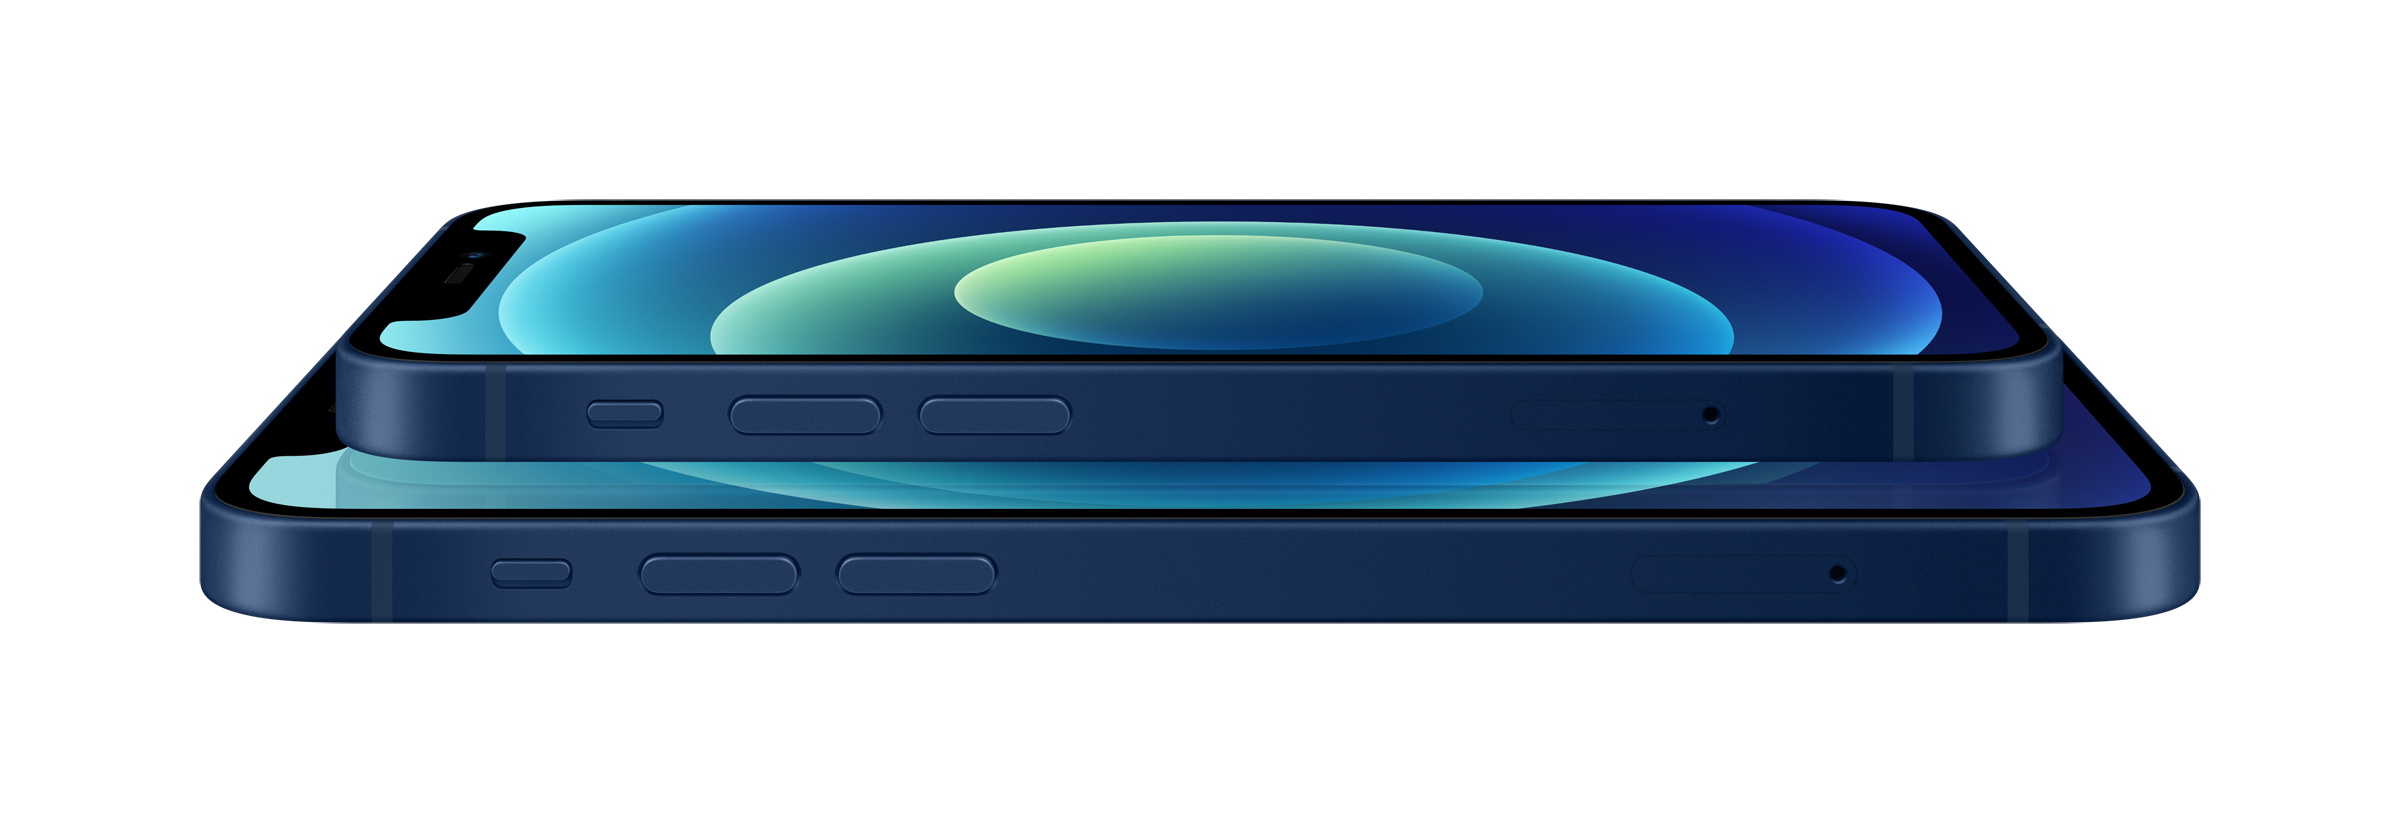 iPhone 12_iPhone 12 mini